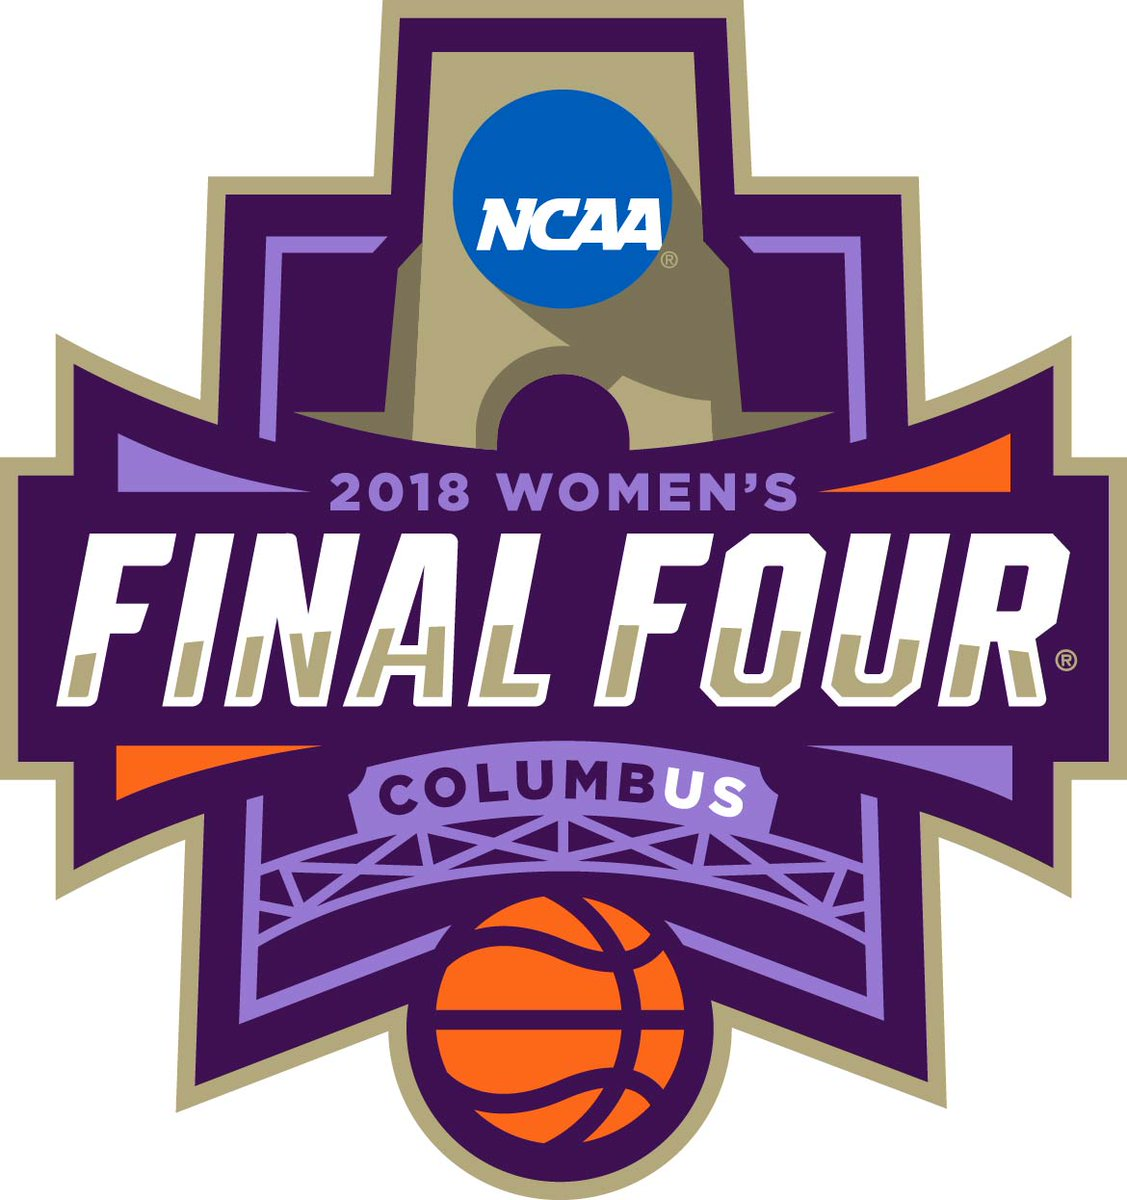 NCAA Womens Final Four Logo Primary Logo (2018) - 2018 Women's Final Four - Columbus, OH SportsLogos.Net